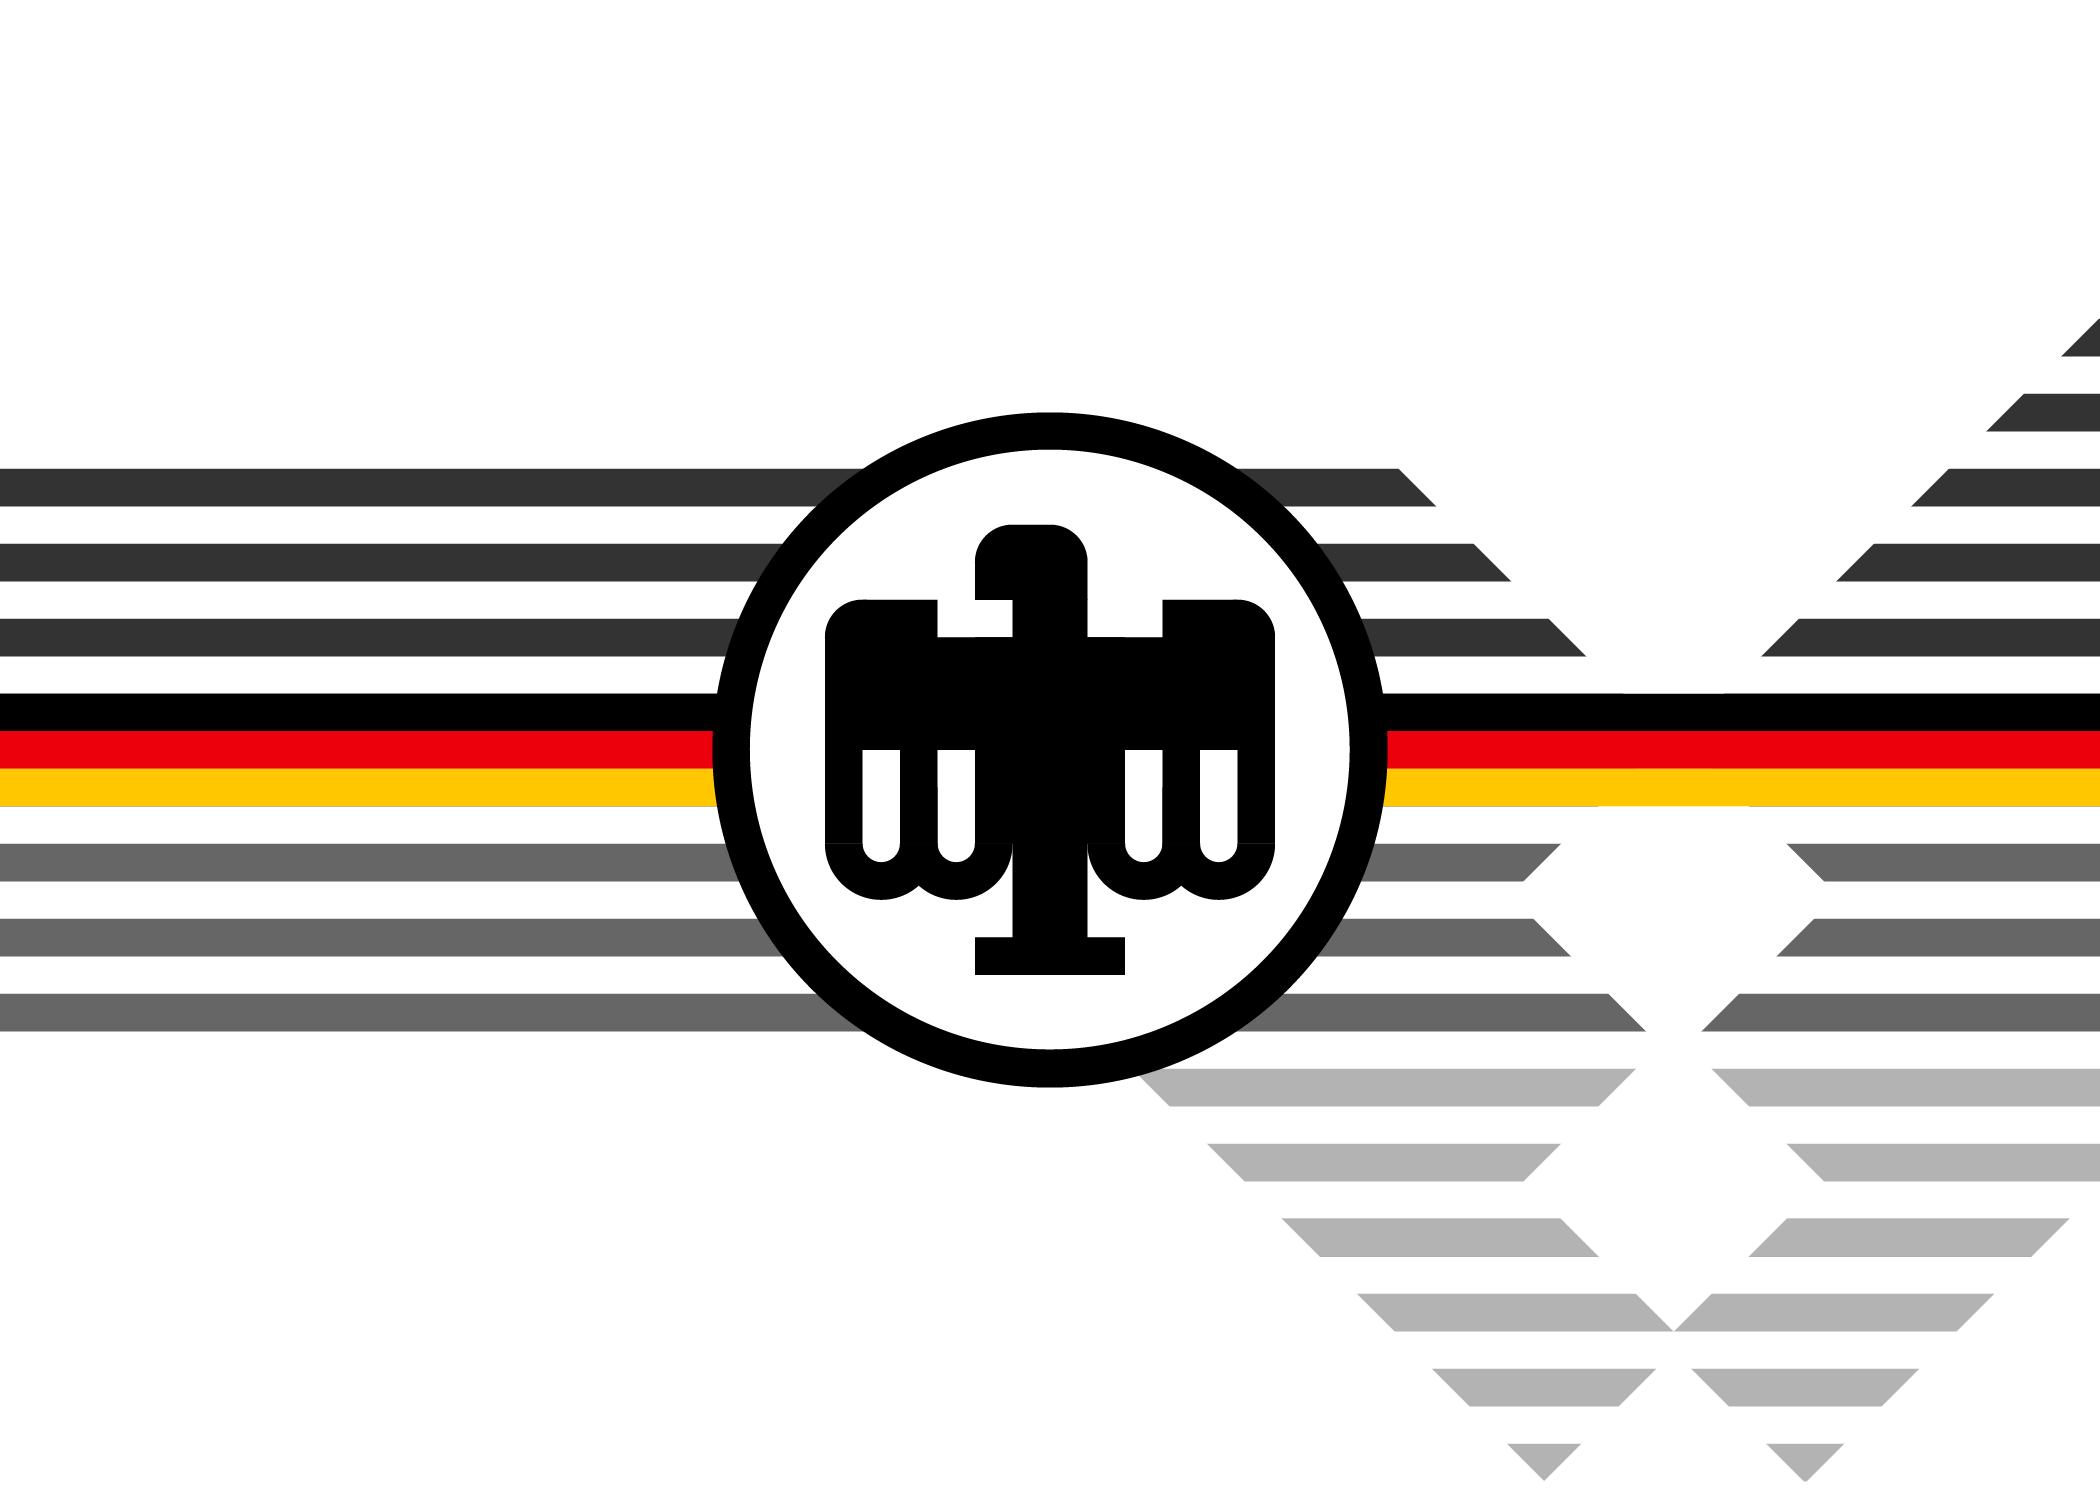 Germany-Geometric-World-Cup-Football-Badge-01-Logo-Design-Freelance-Kent.png